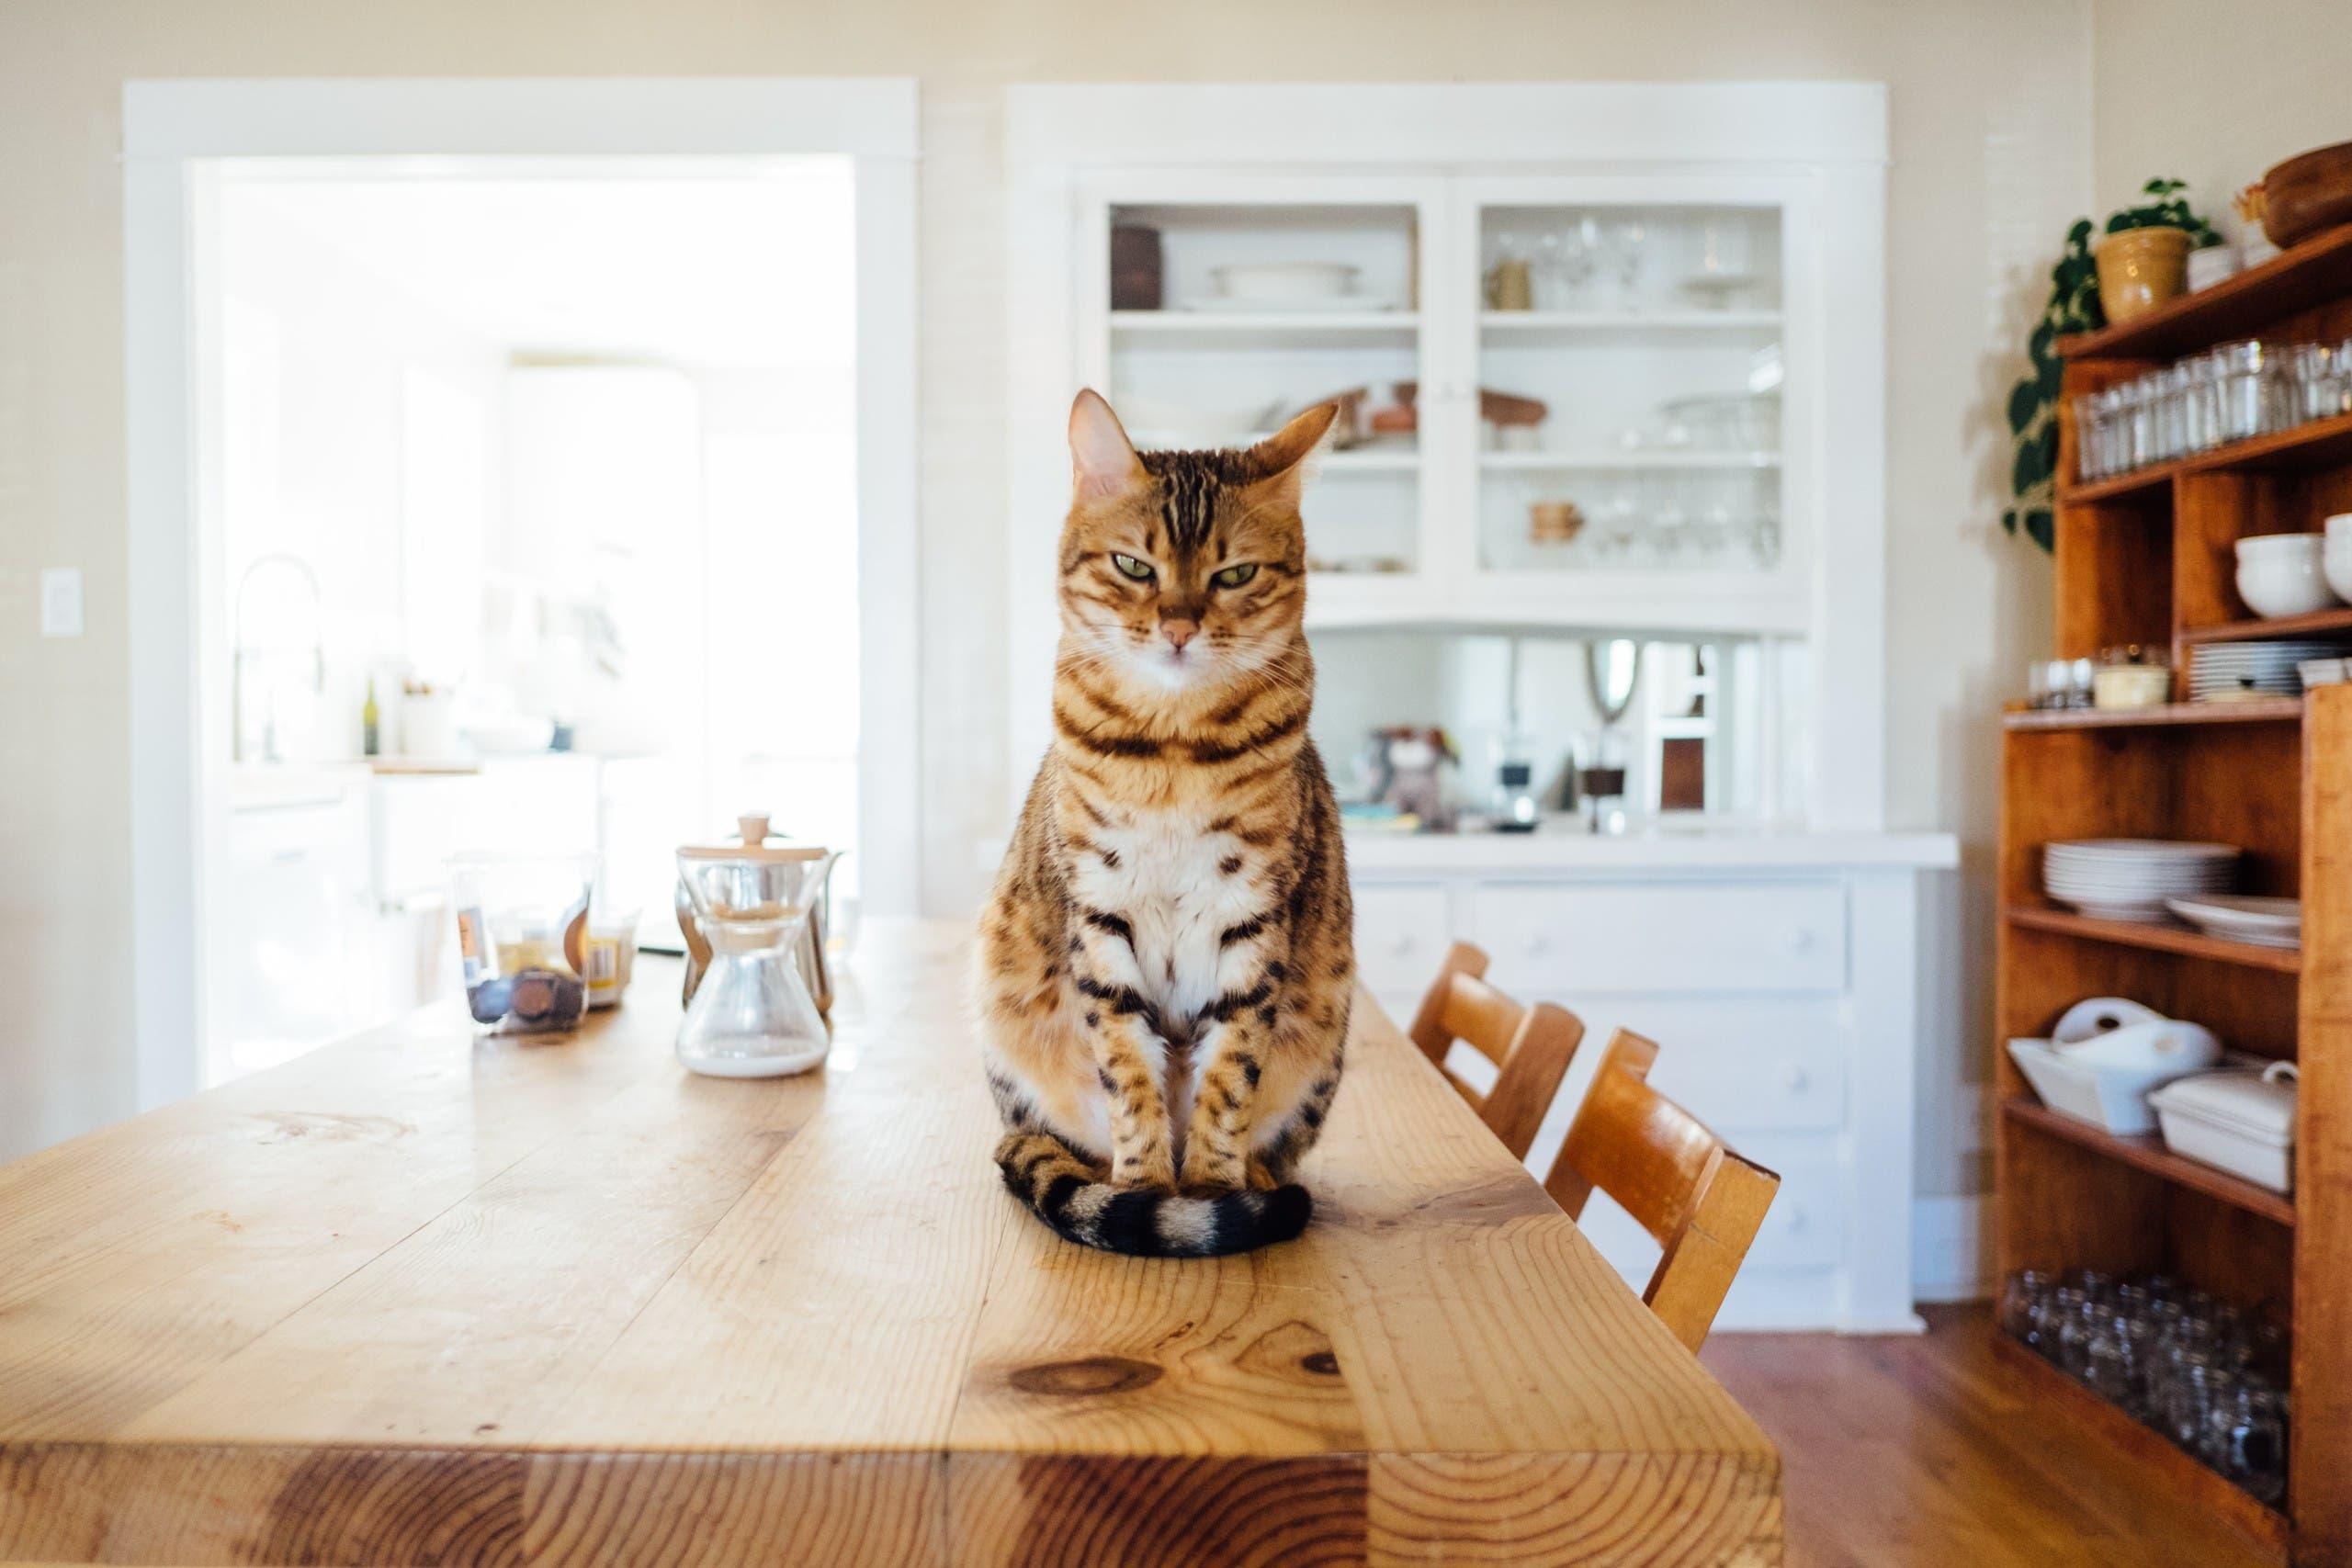 Angry cat. (Unsplash, Paul Hanaoka)